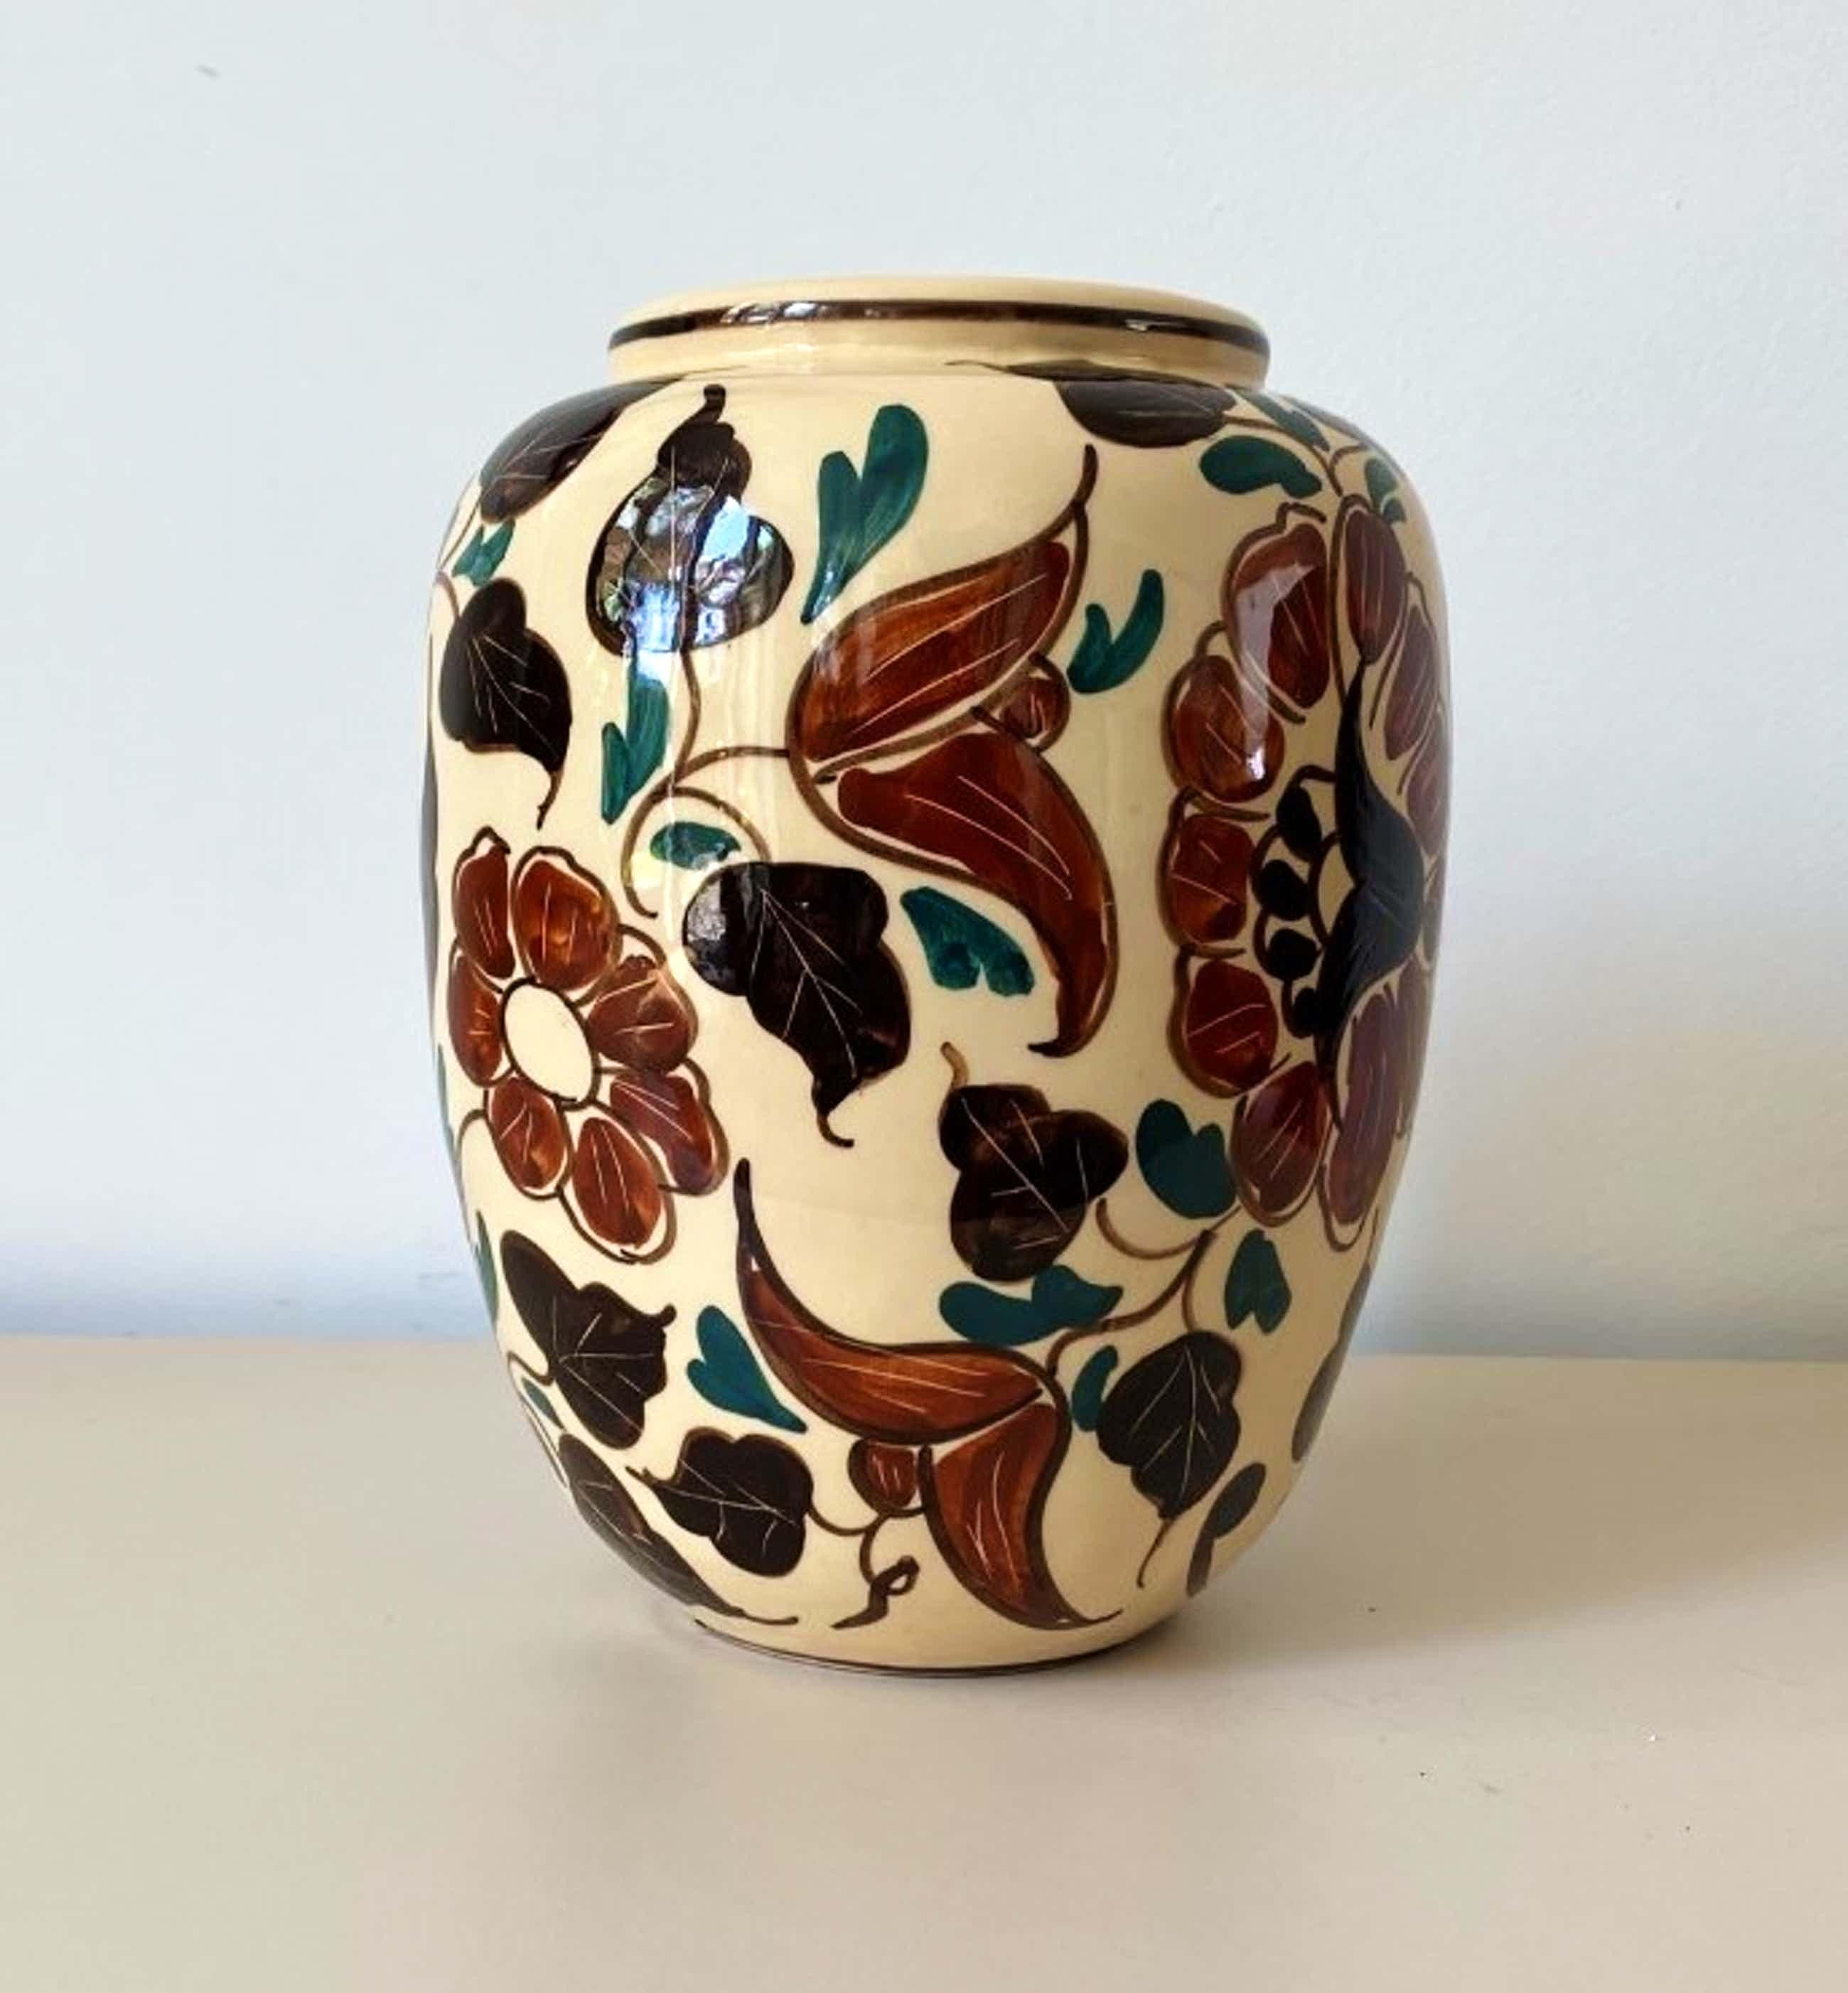 Niet of onleesbaar gesigneerd - Italiaanse Jugendstil aardewerken vaas kopen? Bied vanaf 25!